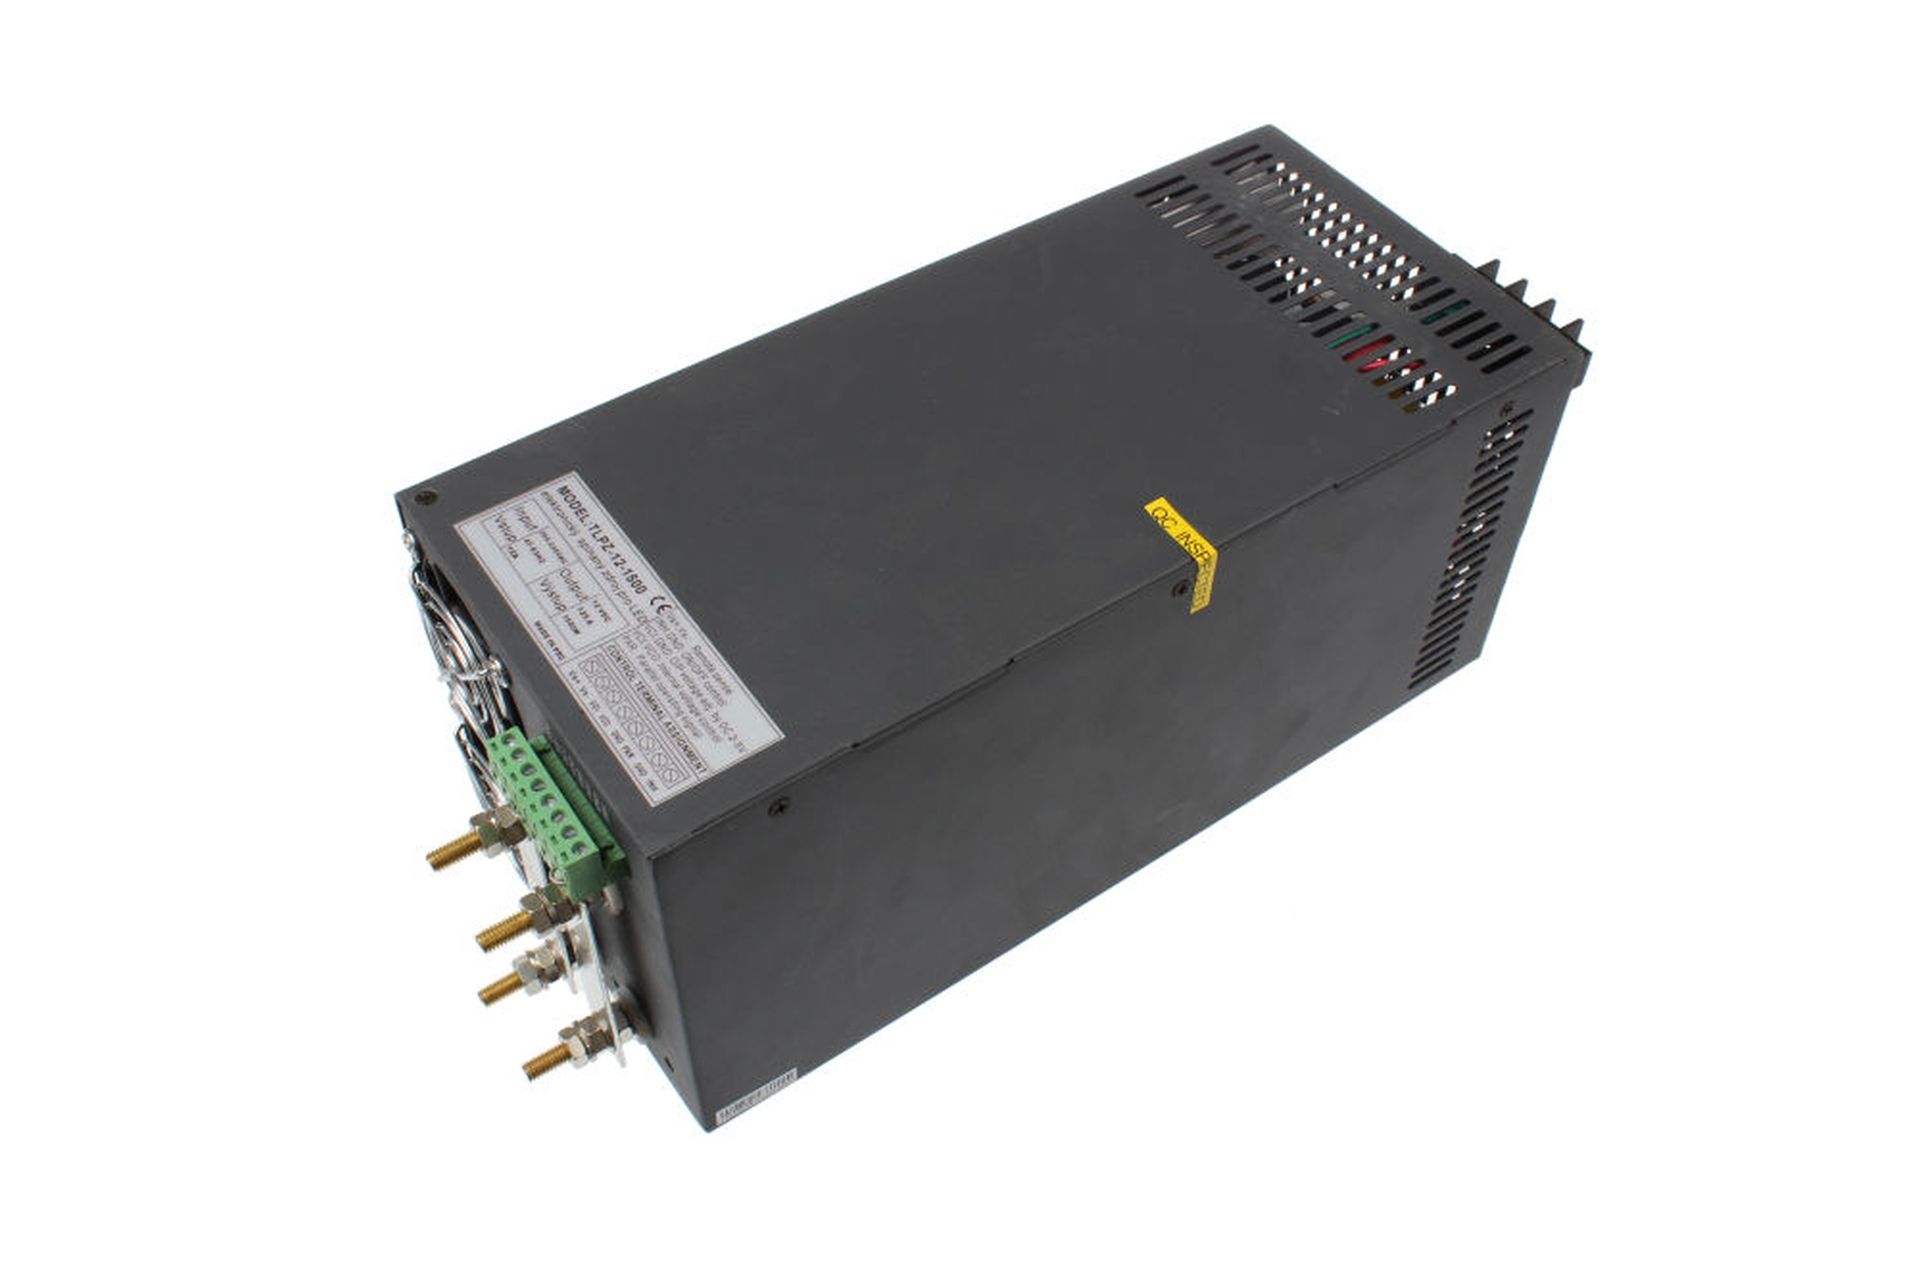 T-LED LED zdroj (trafo) 12V 1500W - vnitřní